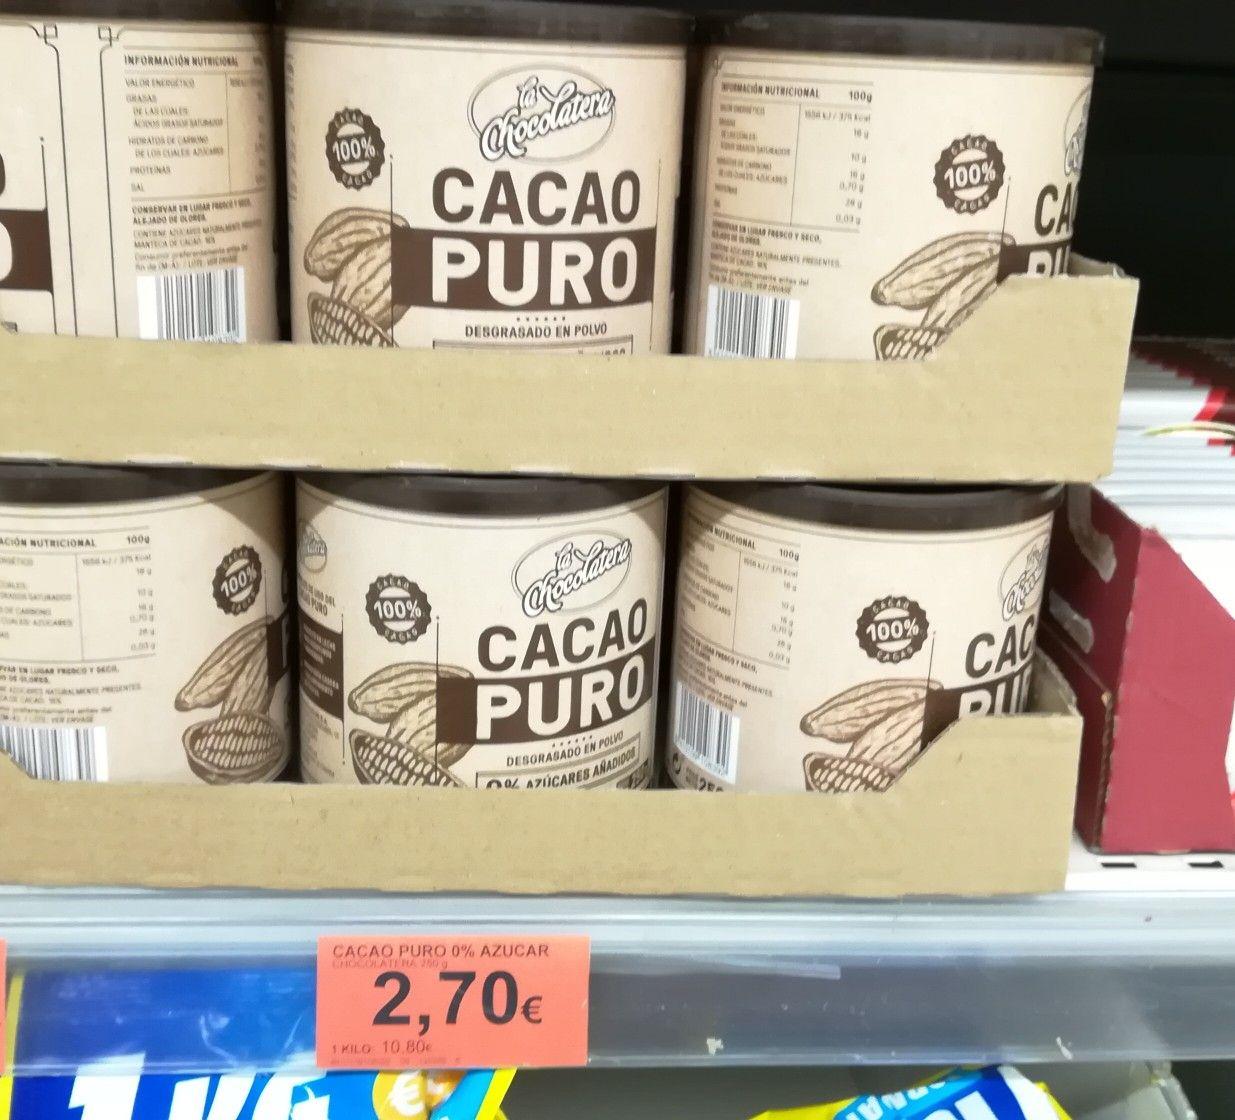 Cacao Puro Mercadona Azucar